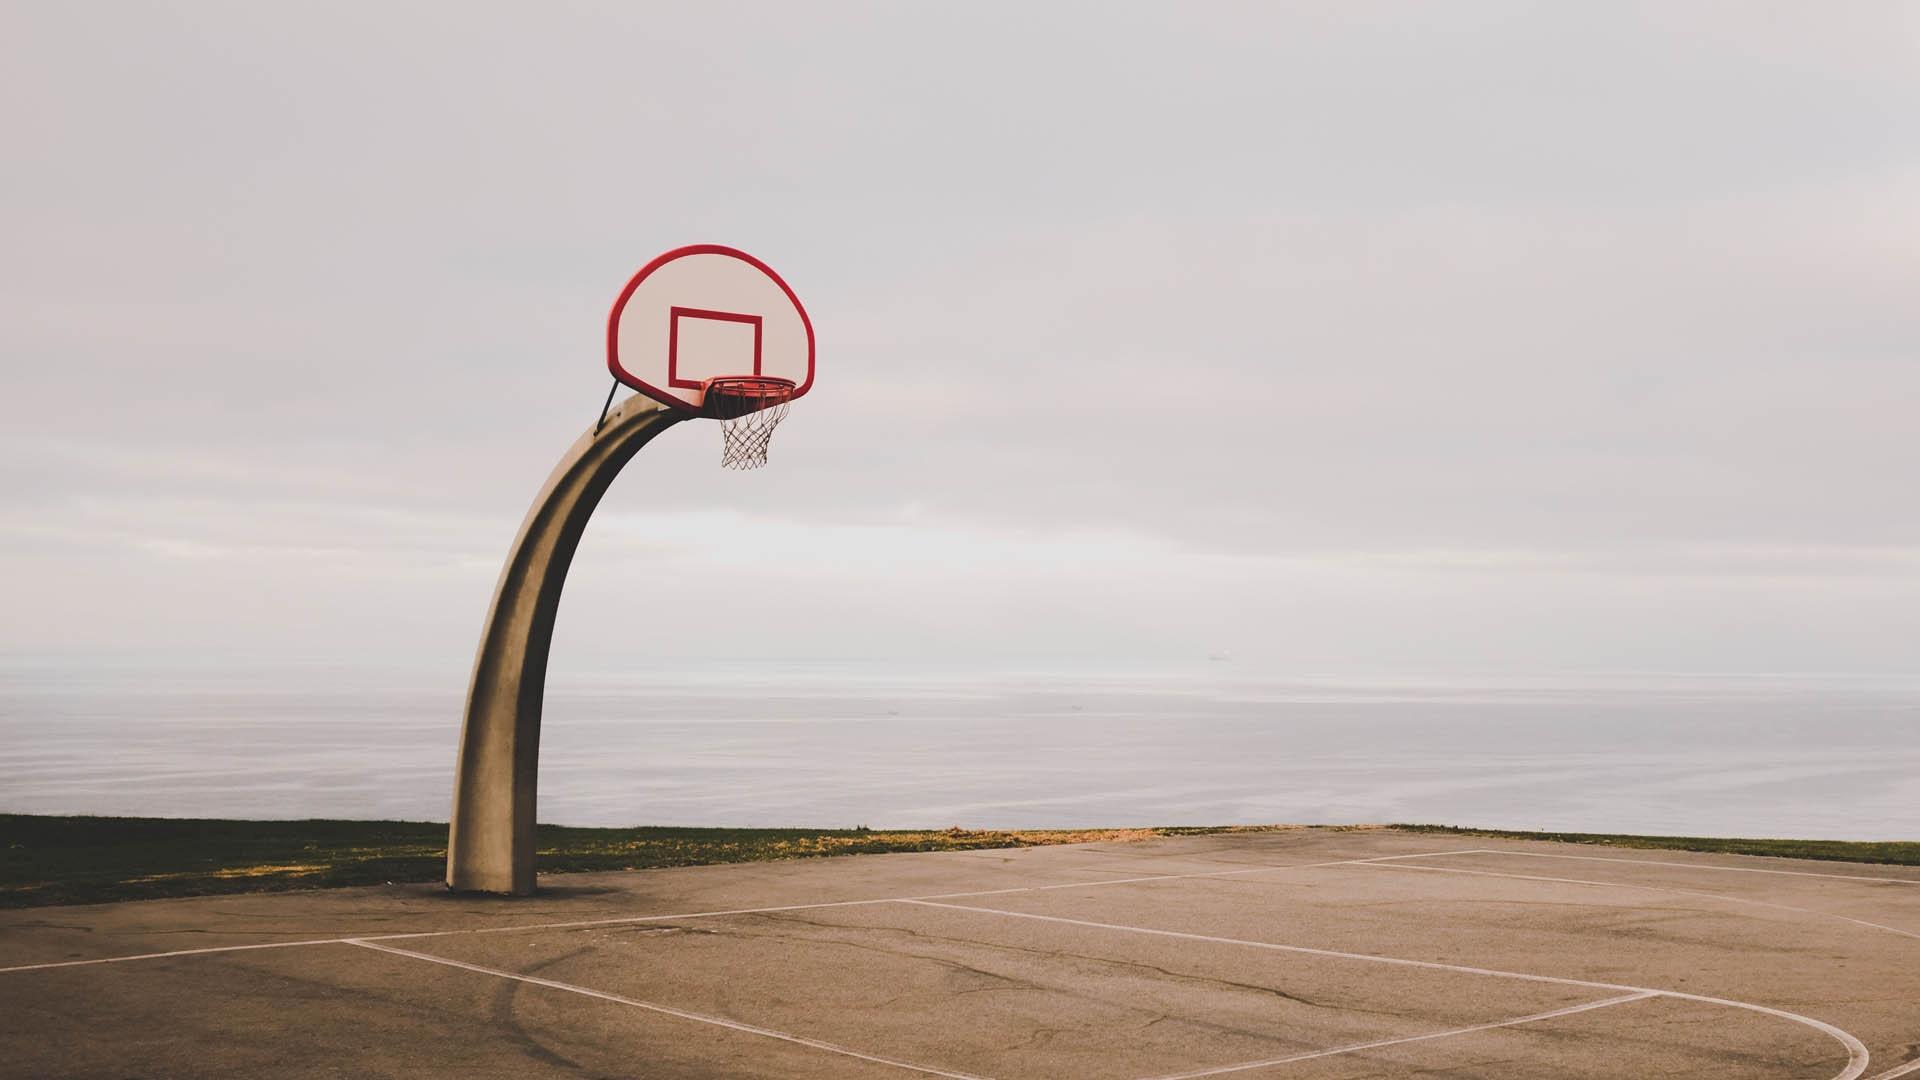 Basketball cool wallpaper